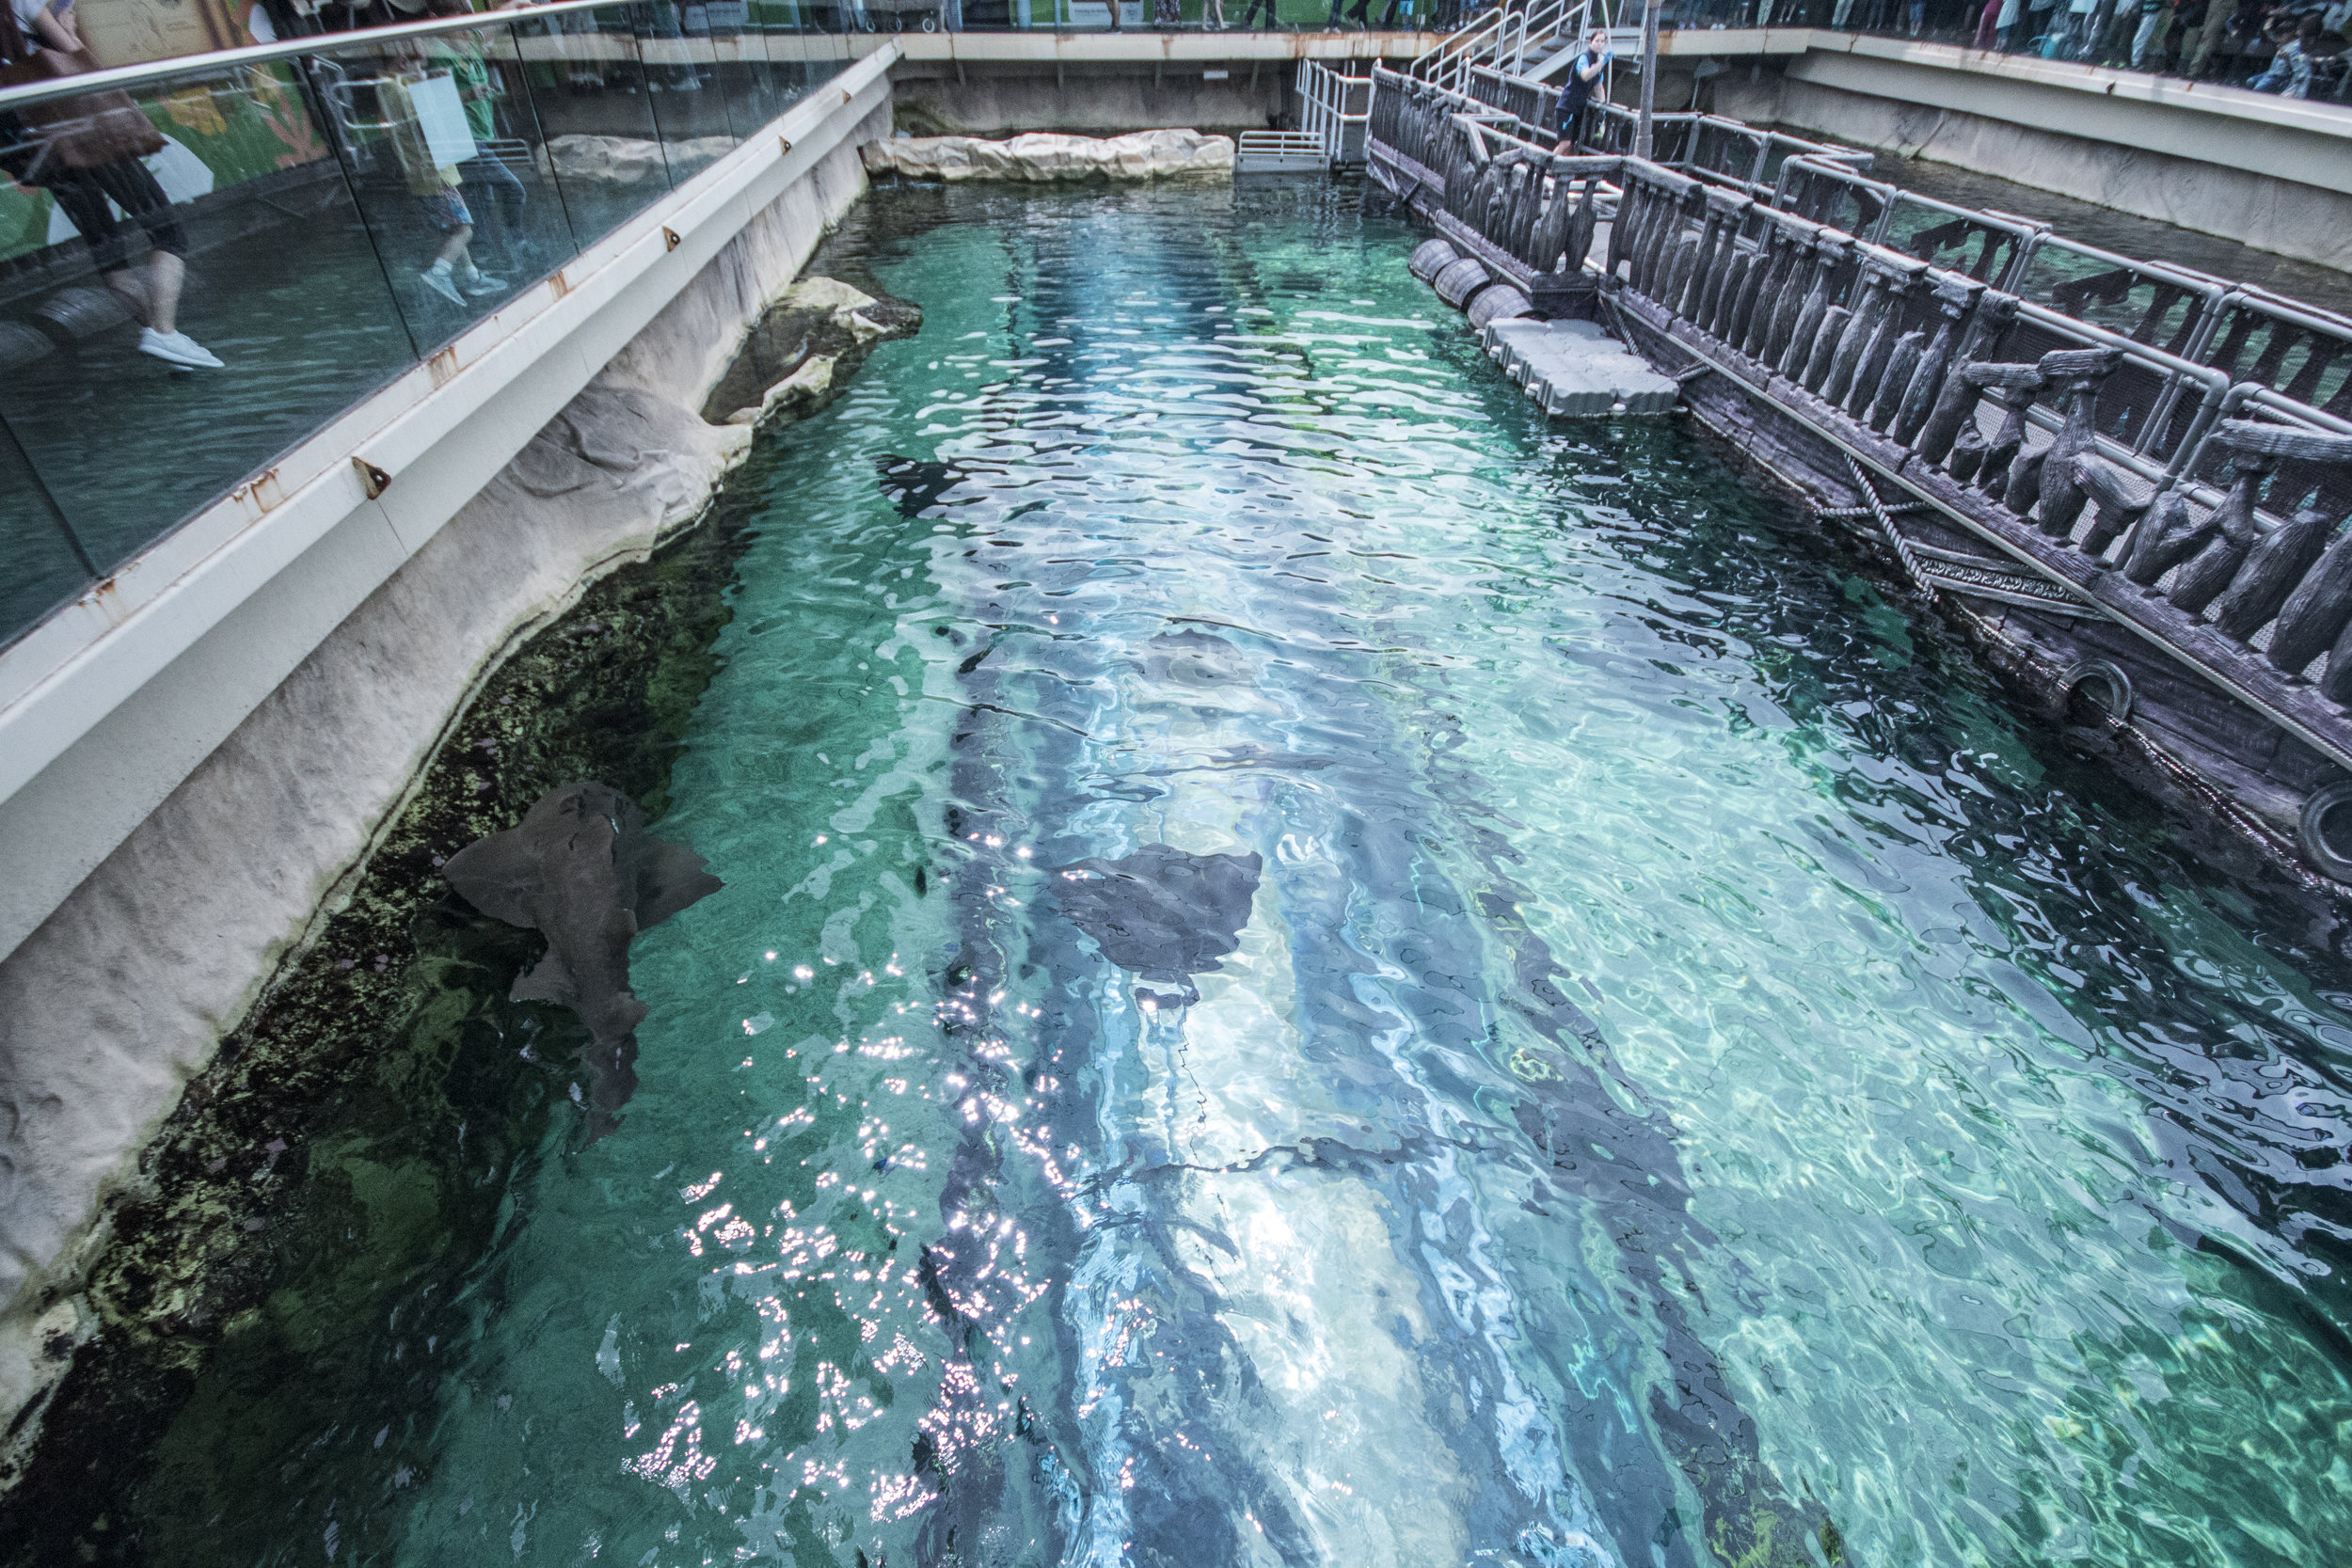 The top views of the walk-through aquarium.